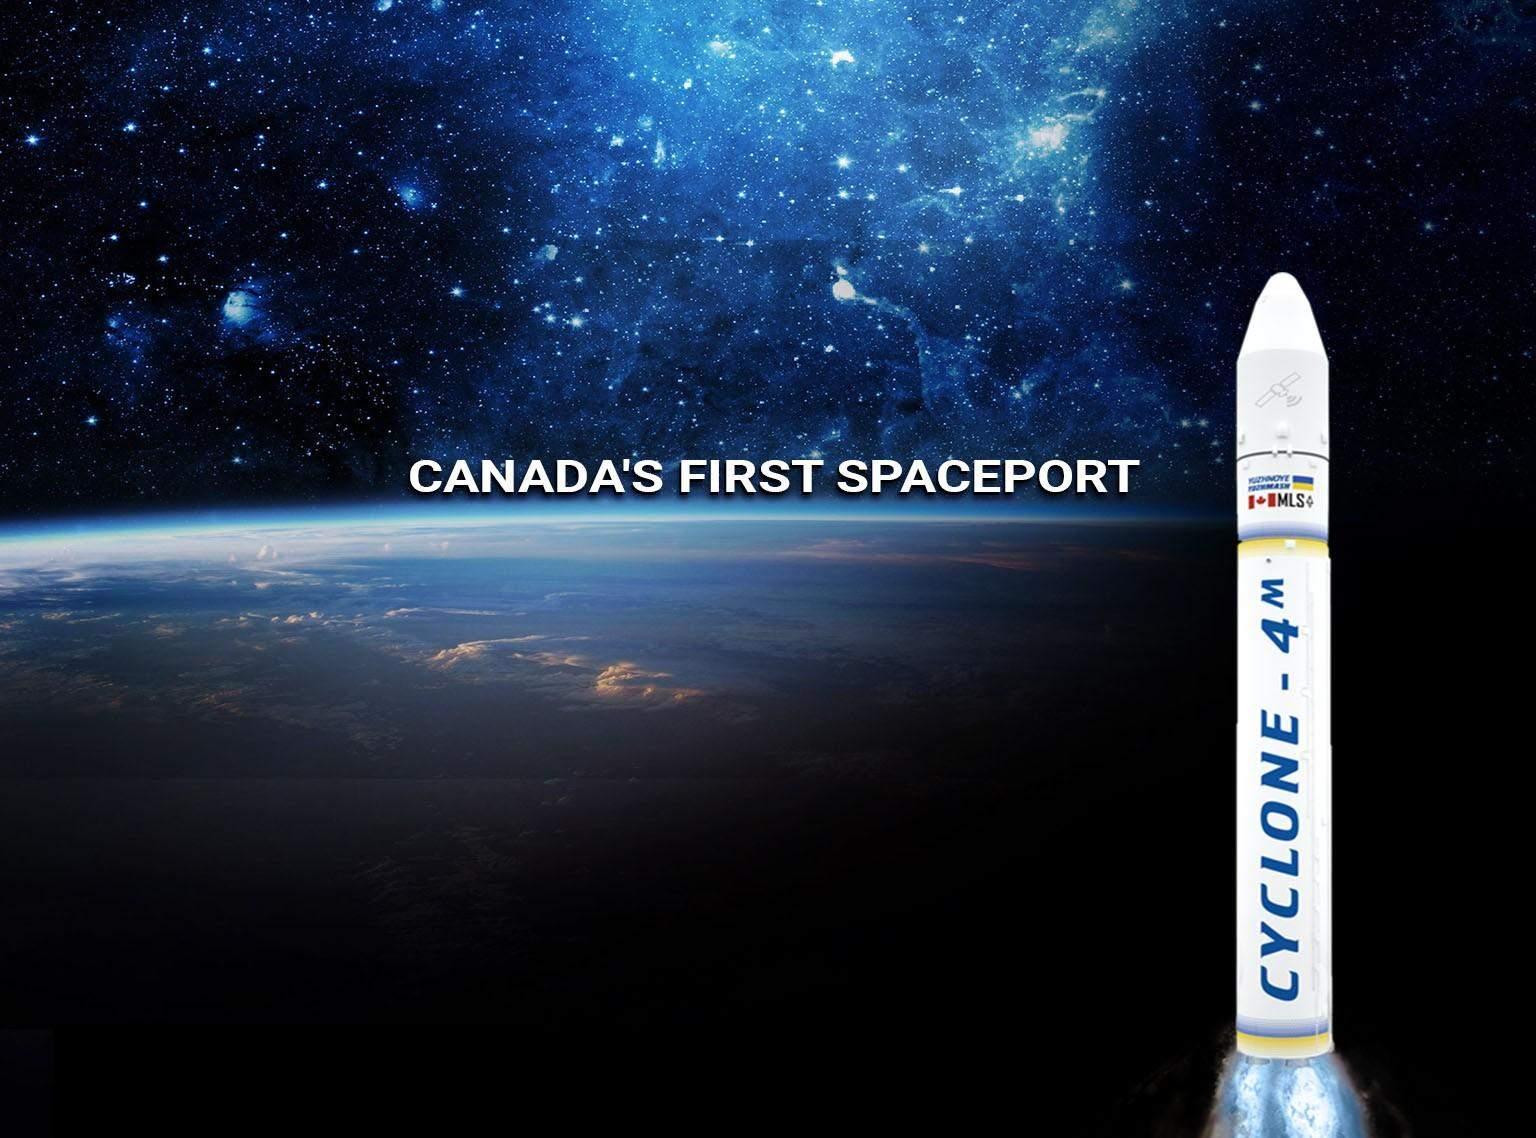 maritime launch services